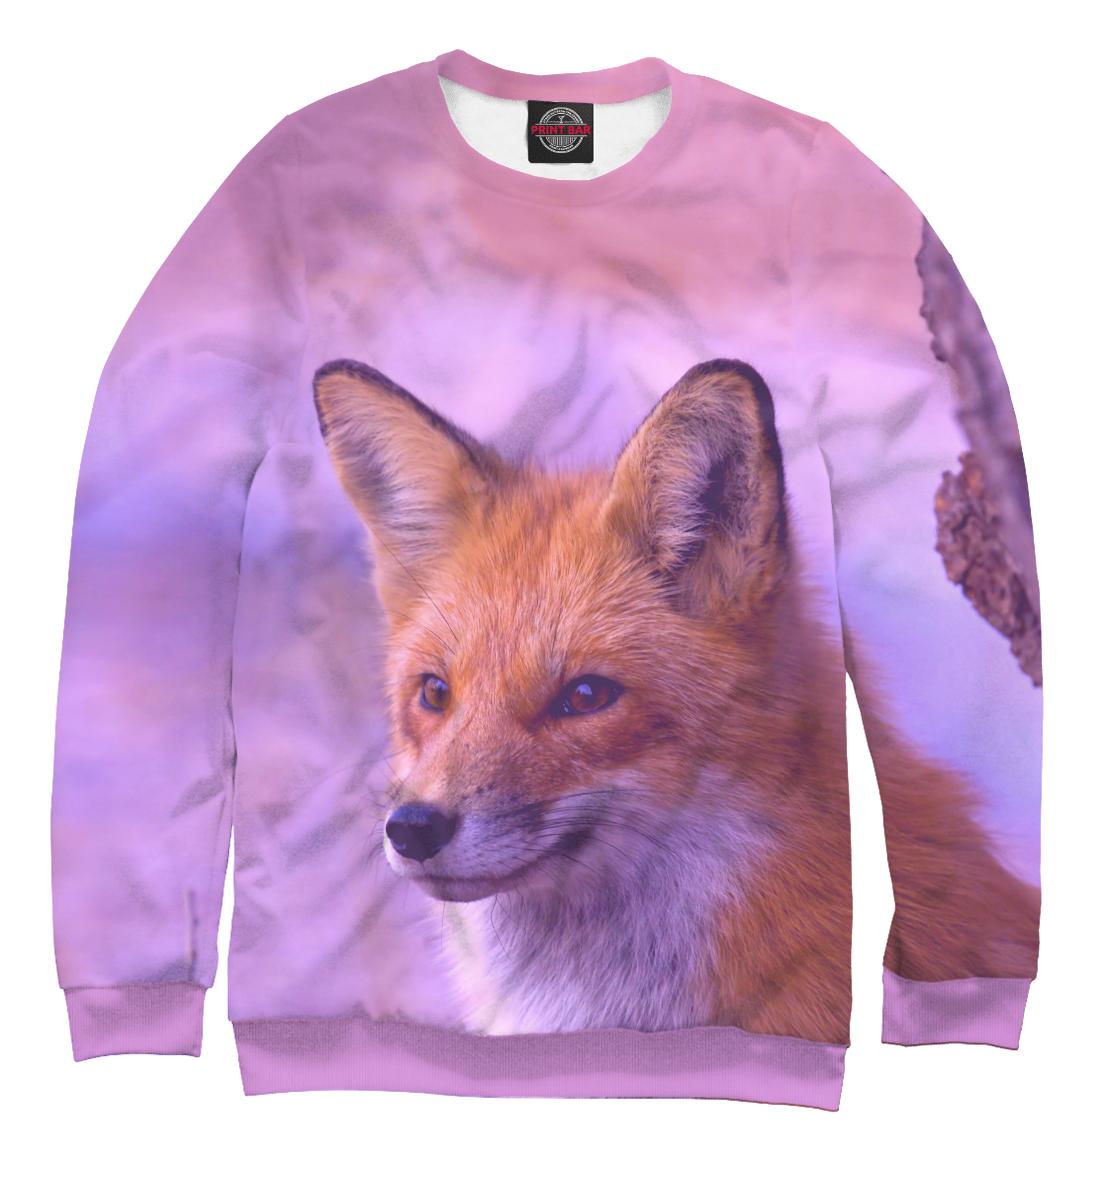 Купить Лисичка, Printbar, Свитшоты, FOX-465901-swi-2